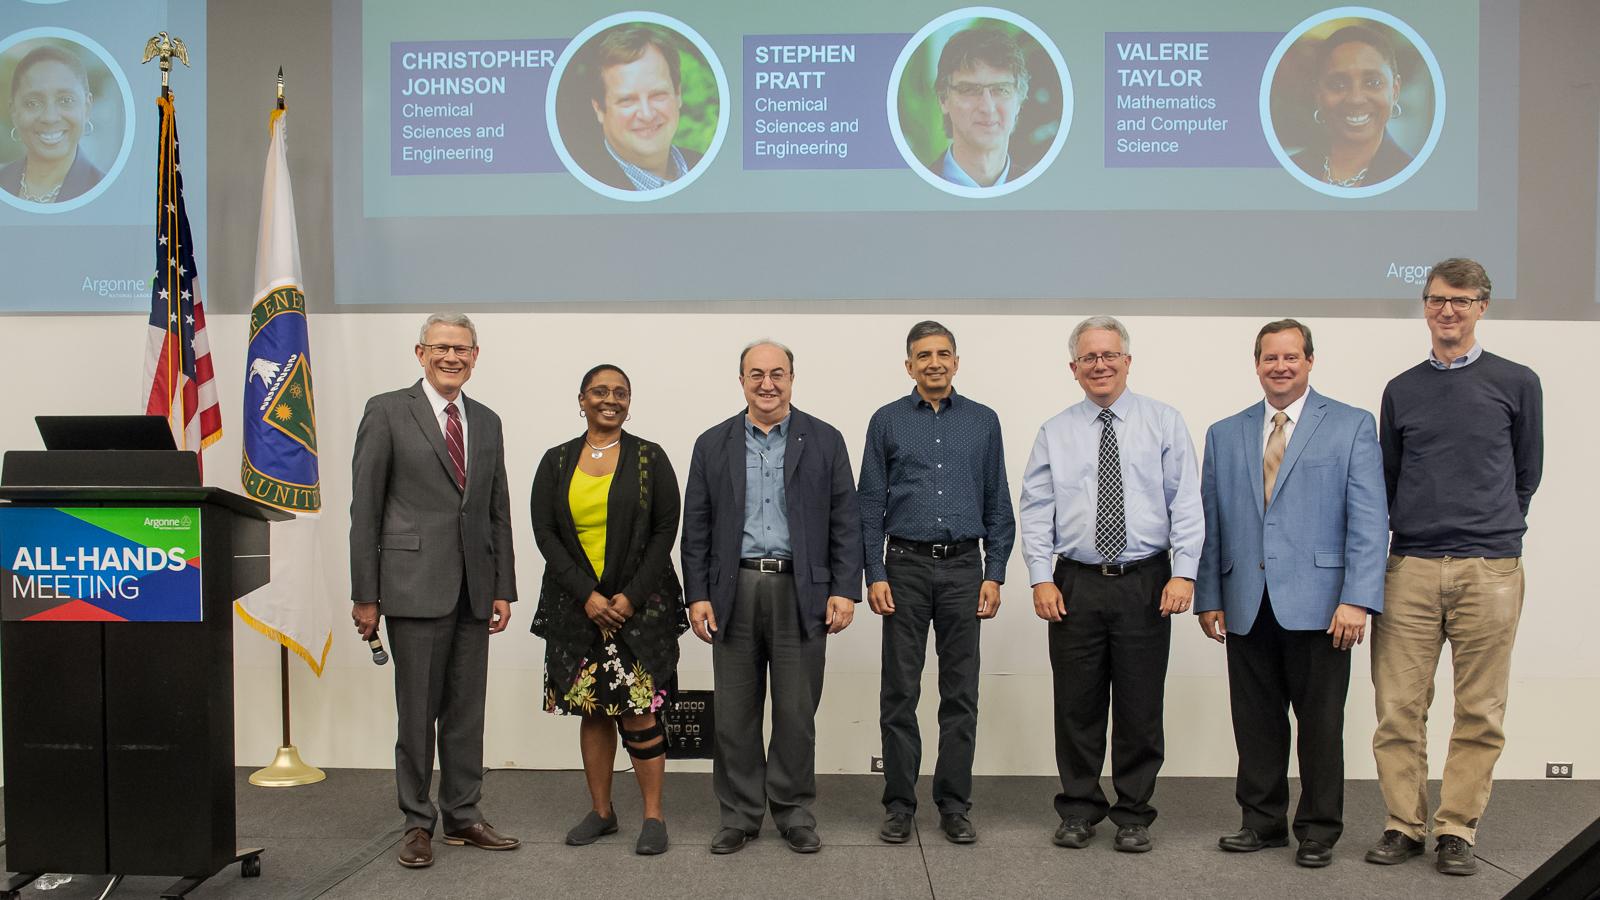 Paul Kearns (Director of Argonne National Laboratory), Valerie Taylor, Esen Ecran Alp, Salman Habib, Robert Hill, Christopher Johnson, Stephen Pratt